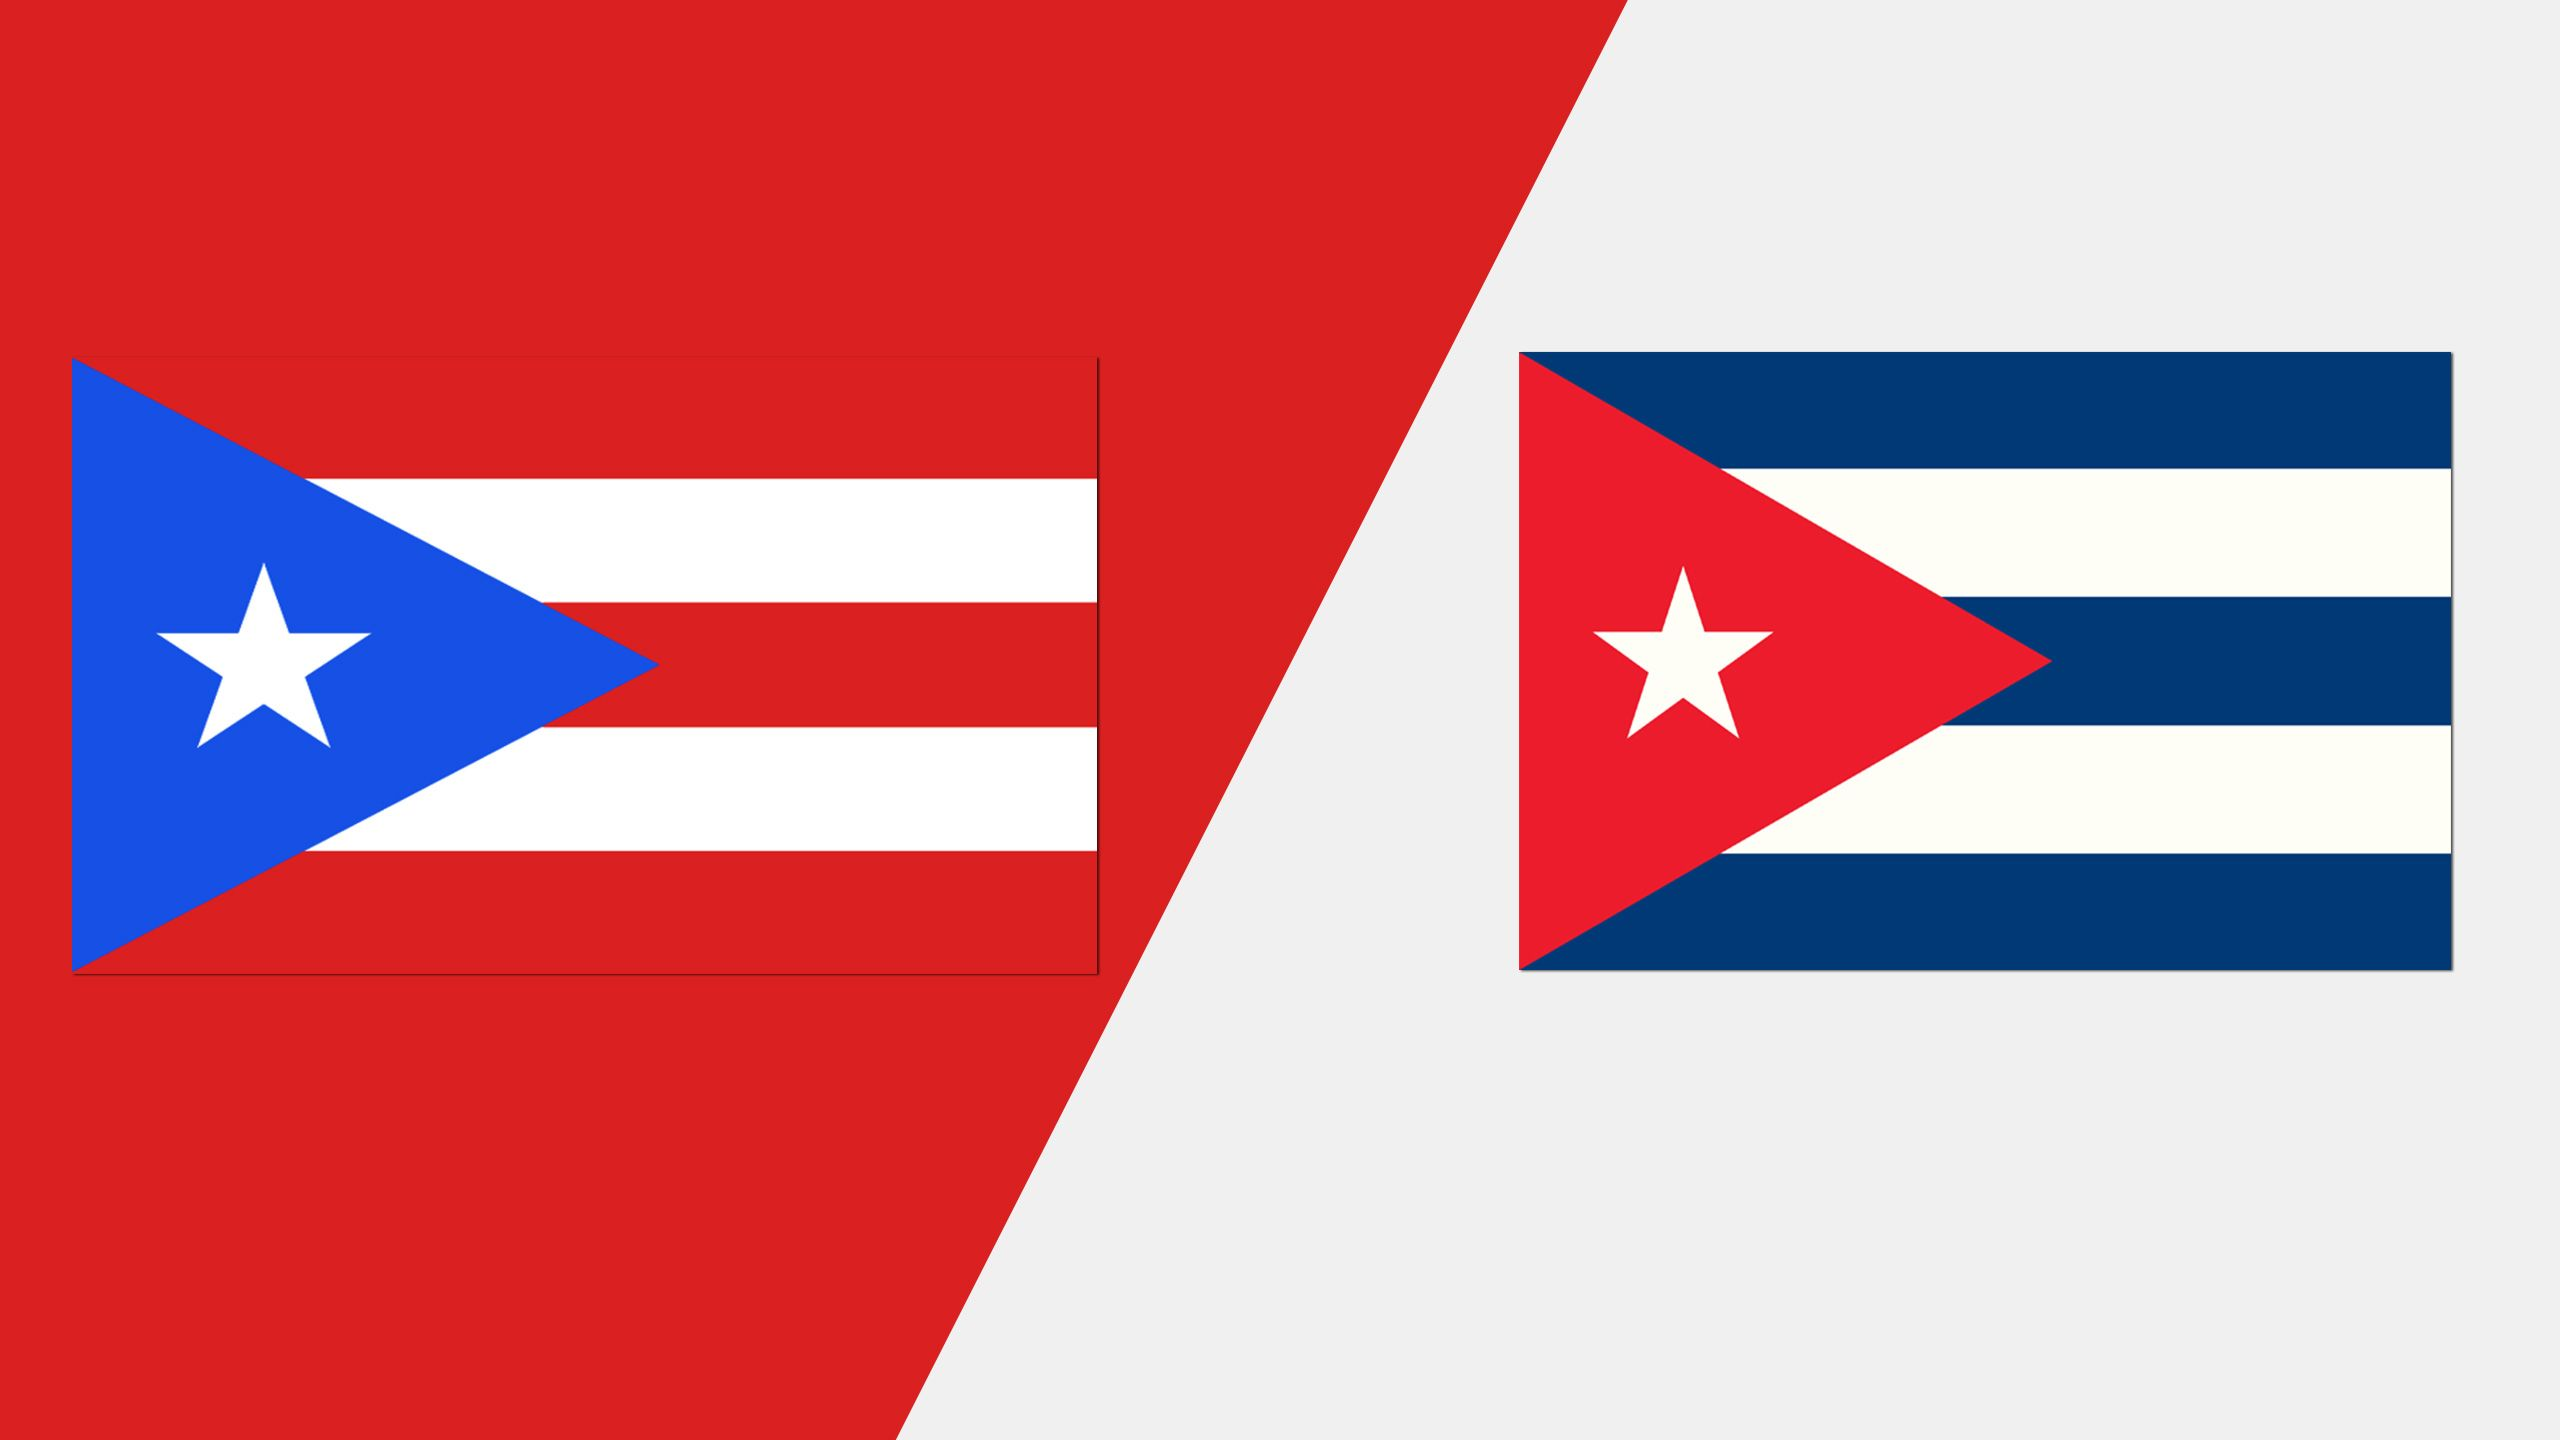 In Spanish - Puerto Rico vs. Cuba